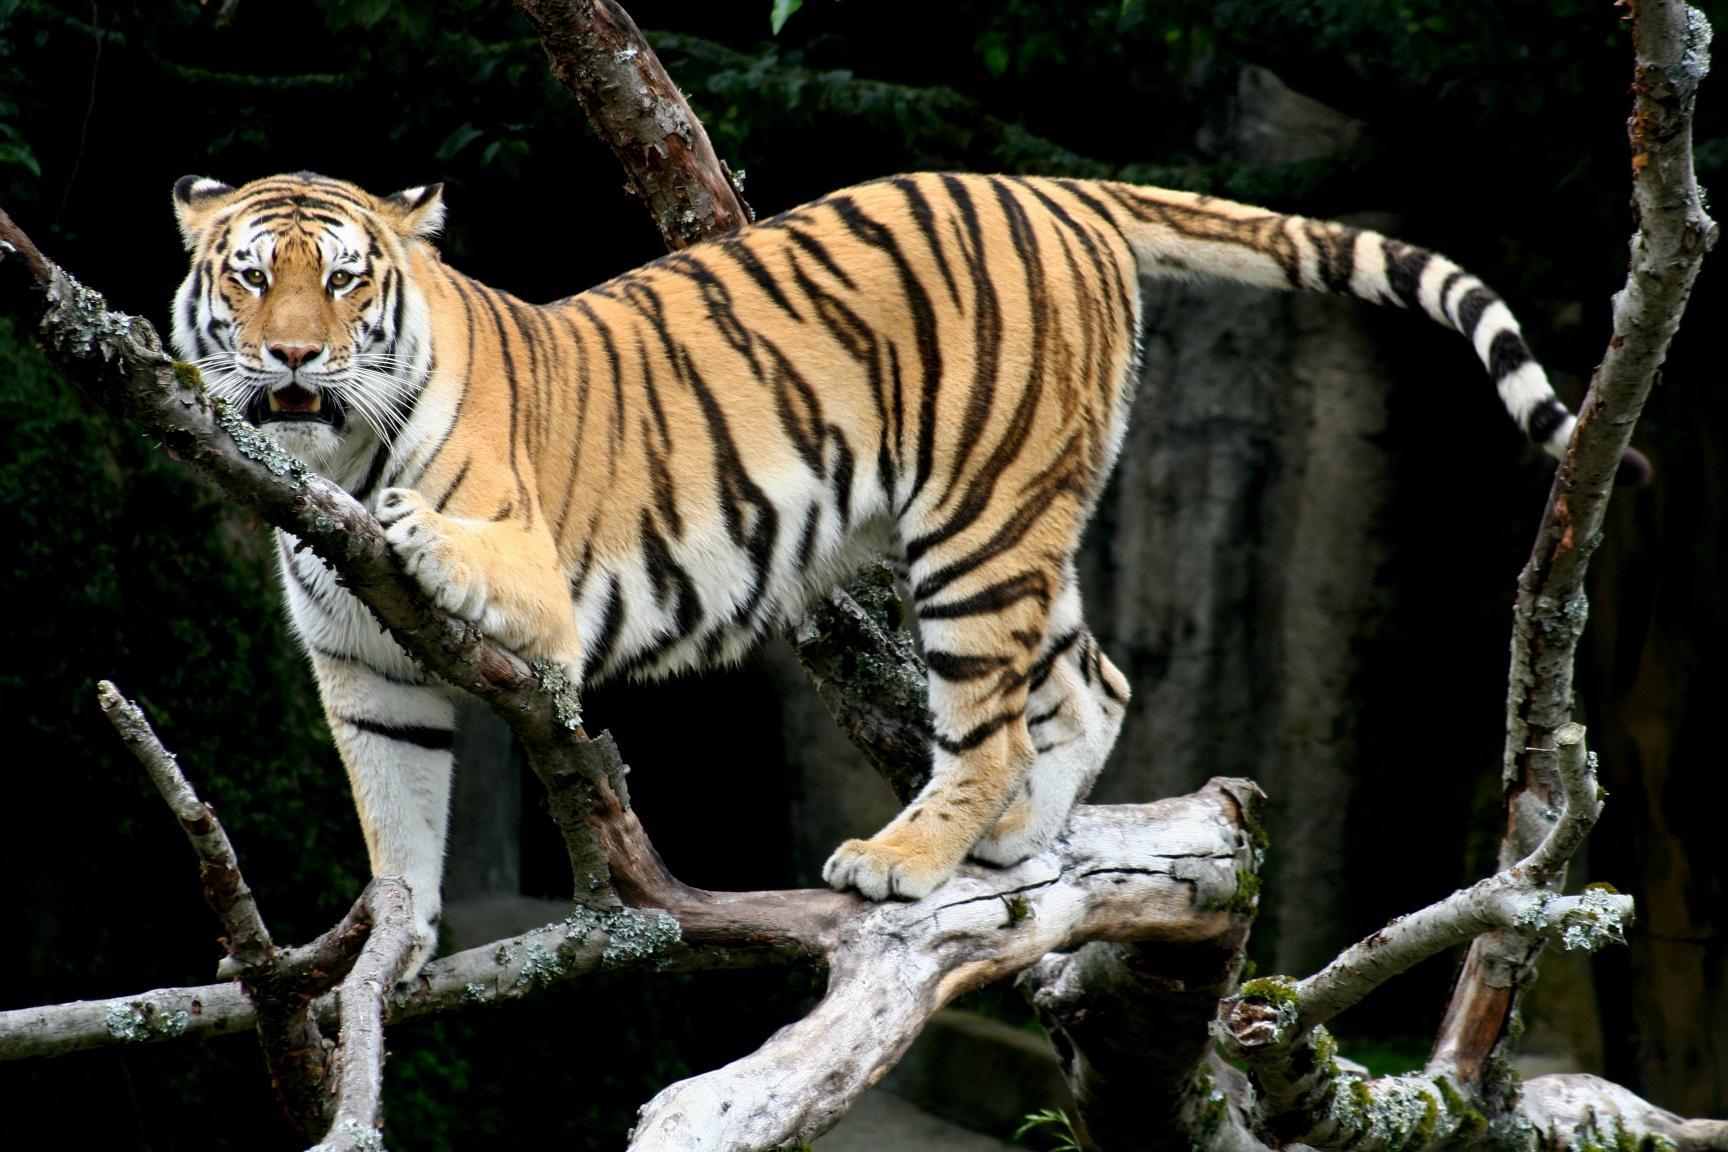 Deep Eyes tigers